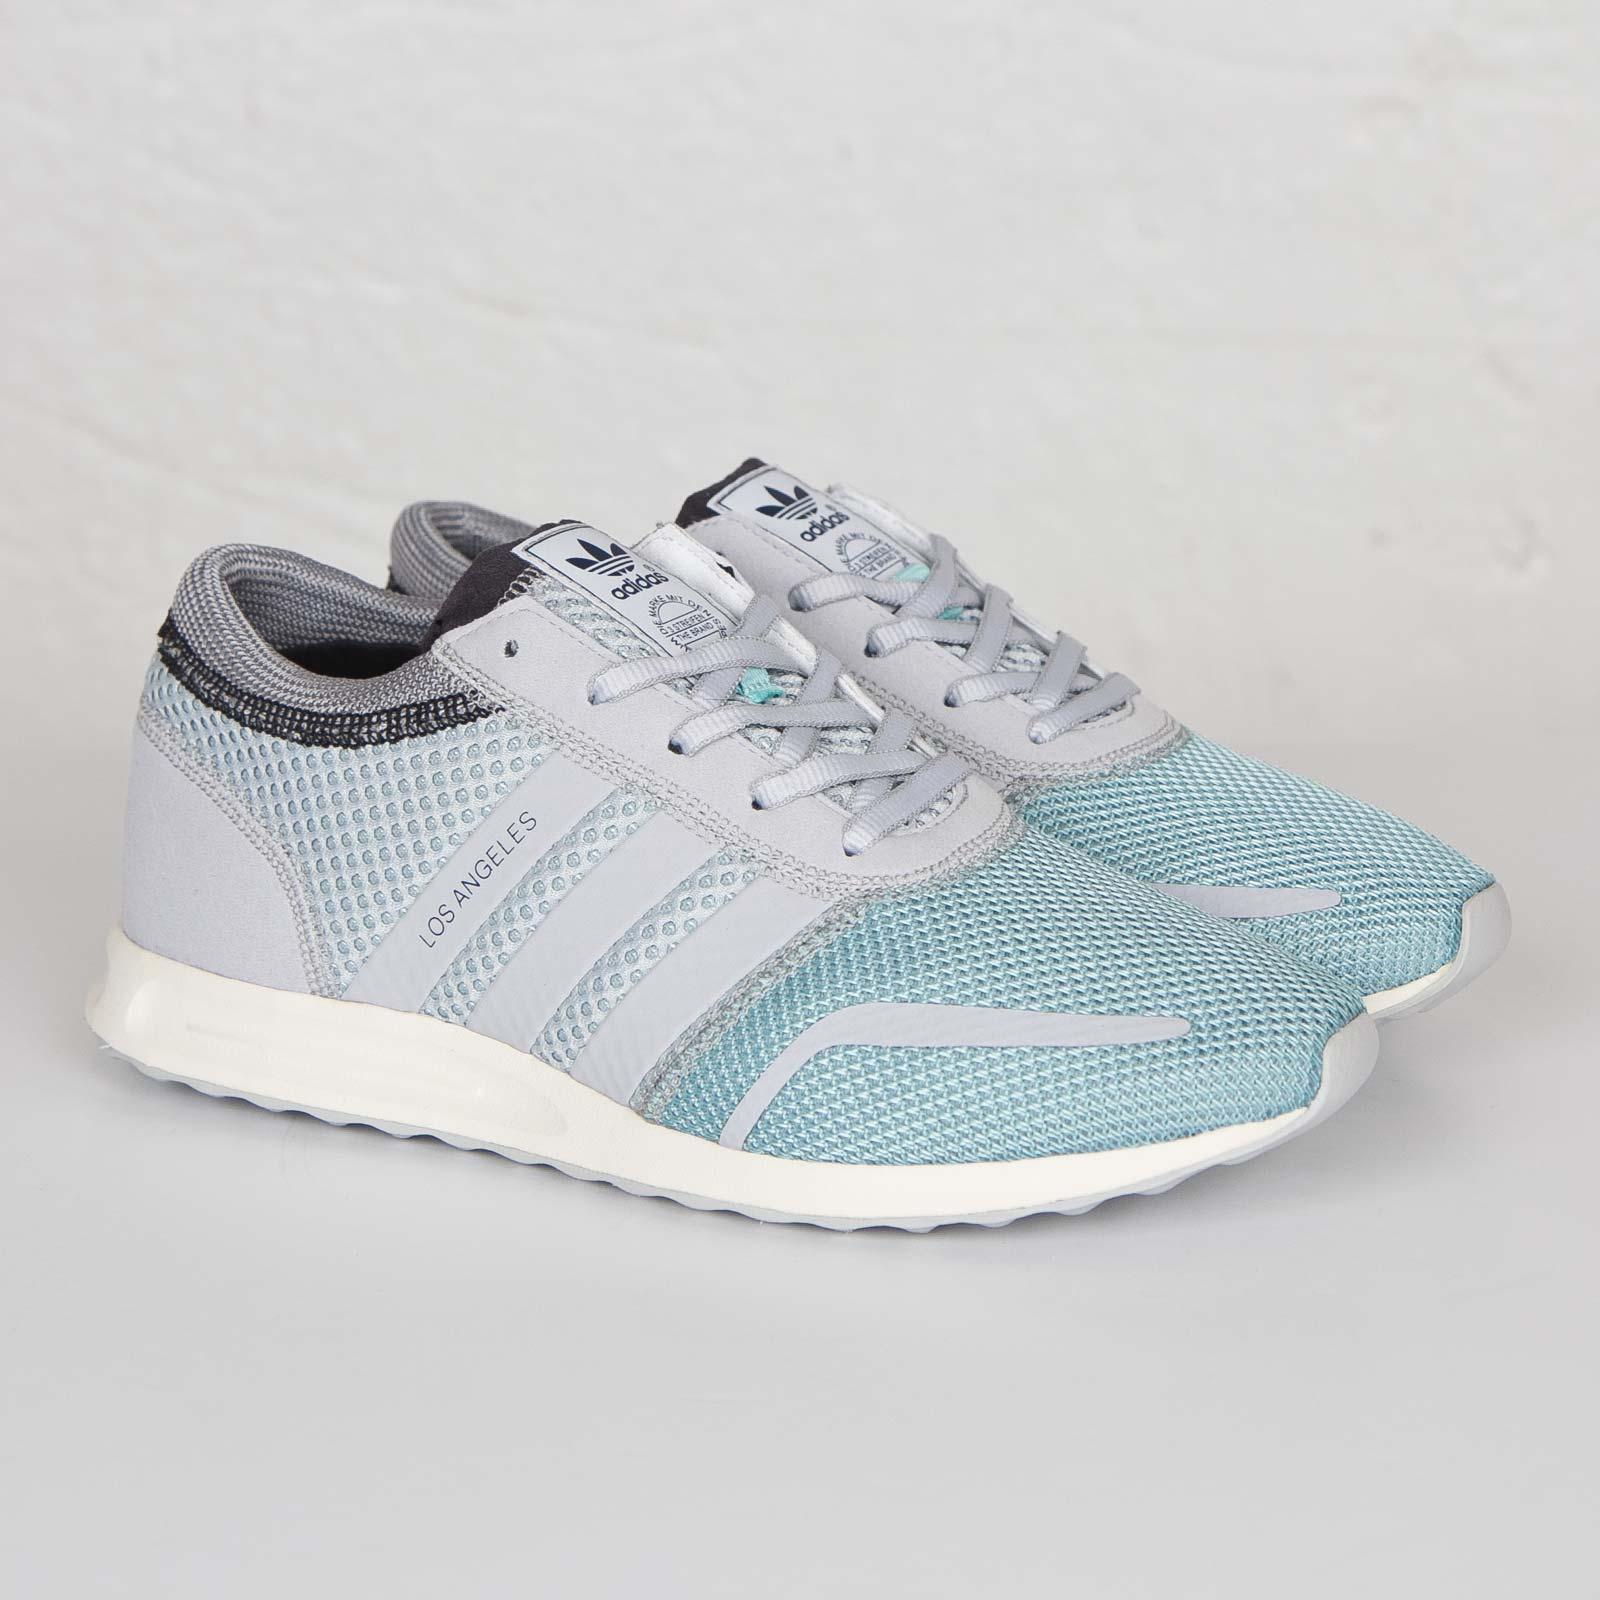 Adidas los angeles s41988 scarpe da ginnasticanstuff scarpe & streetwear